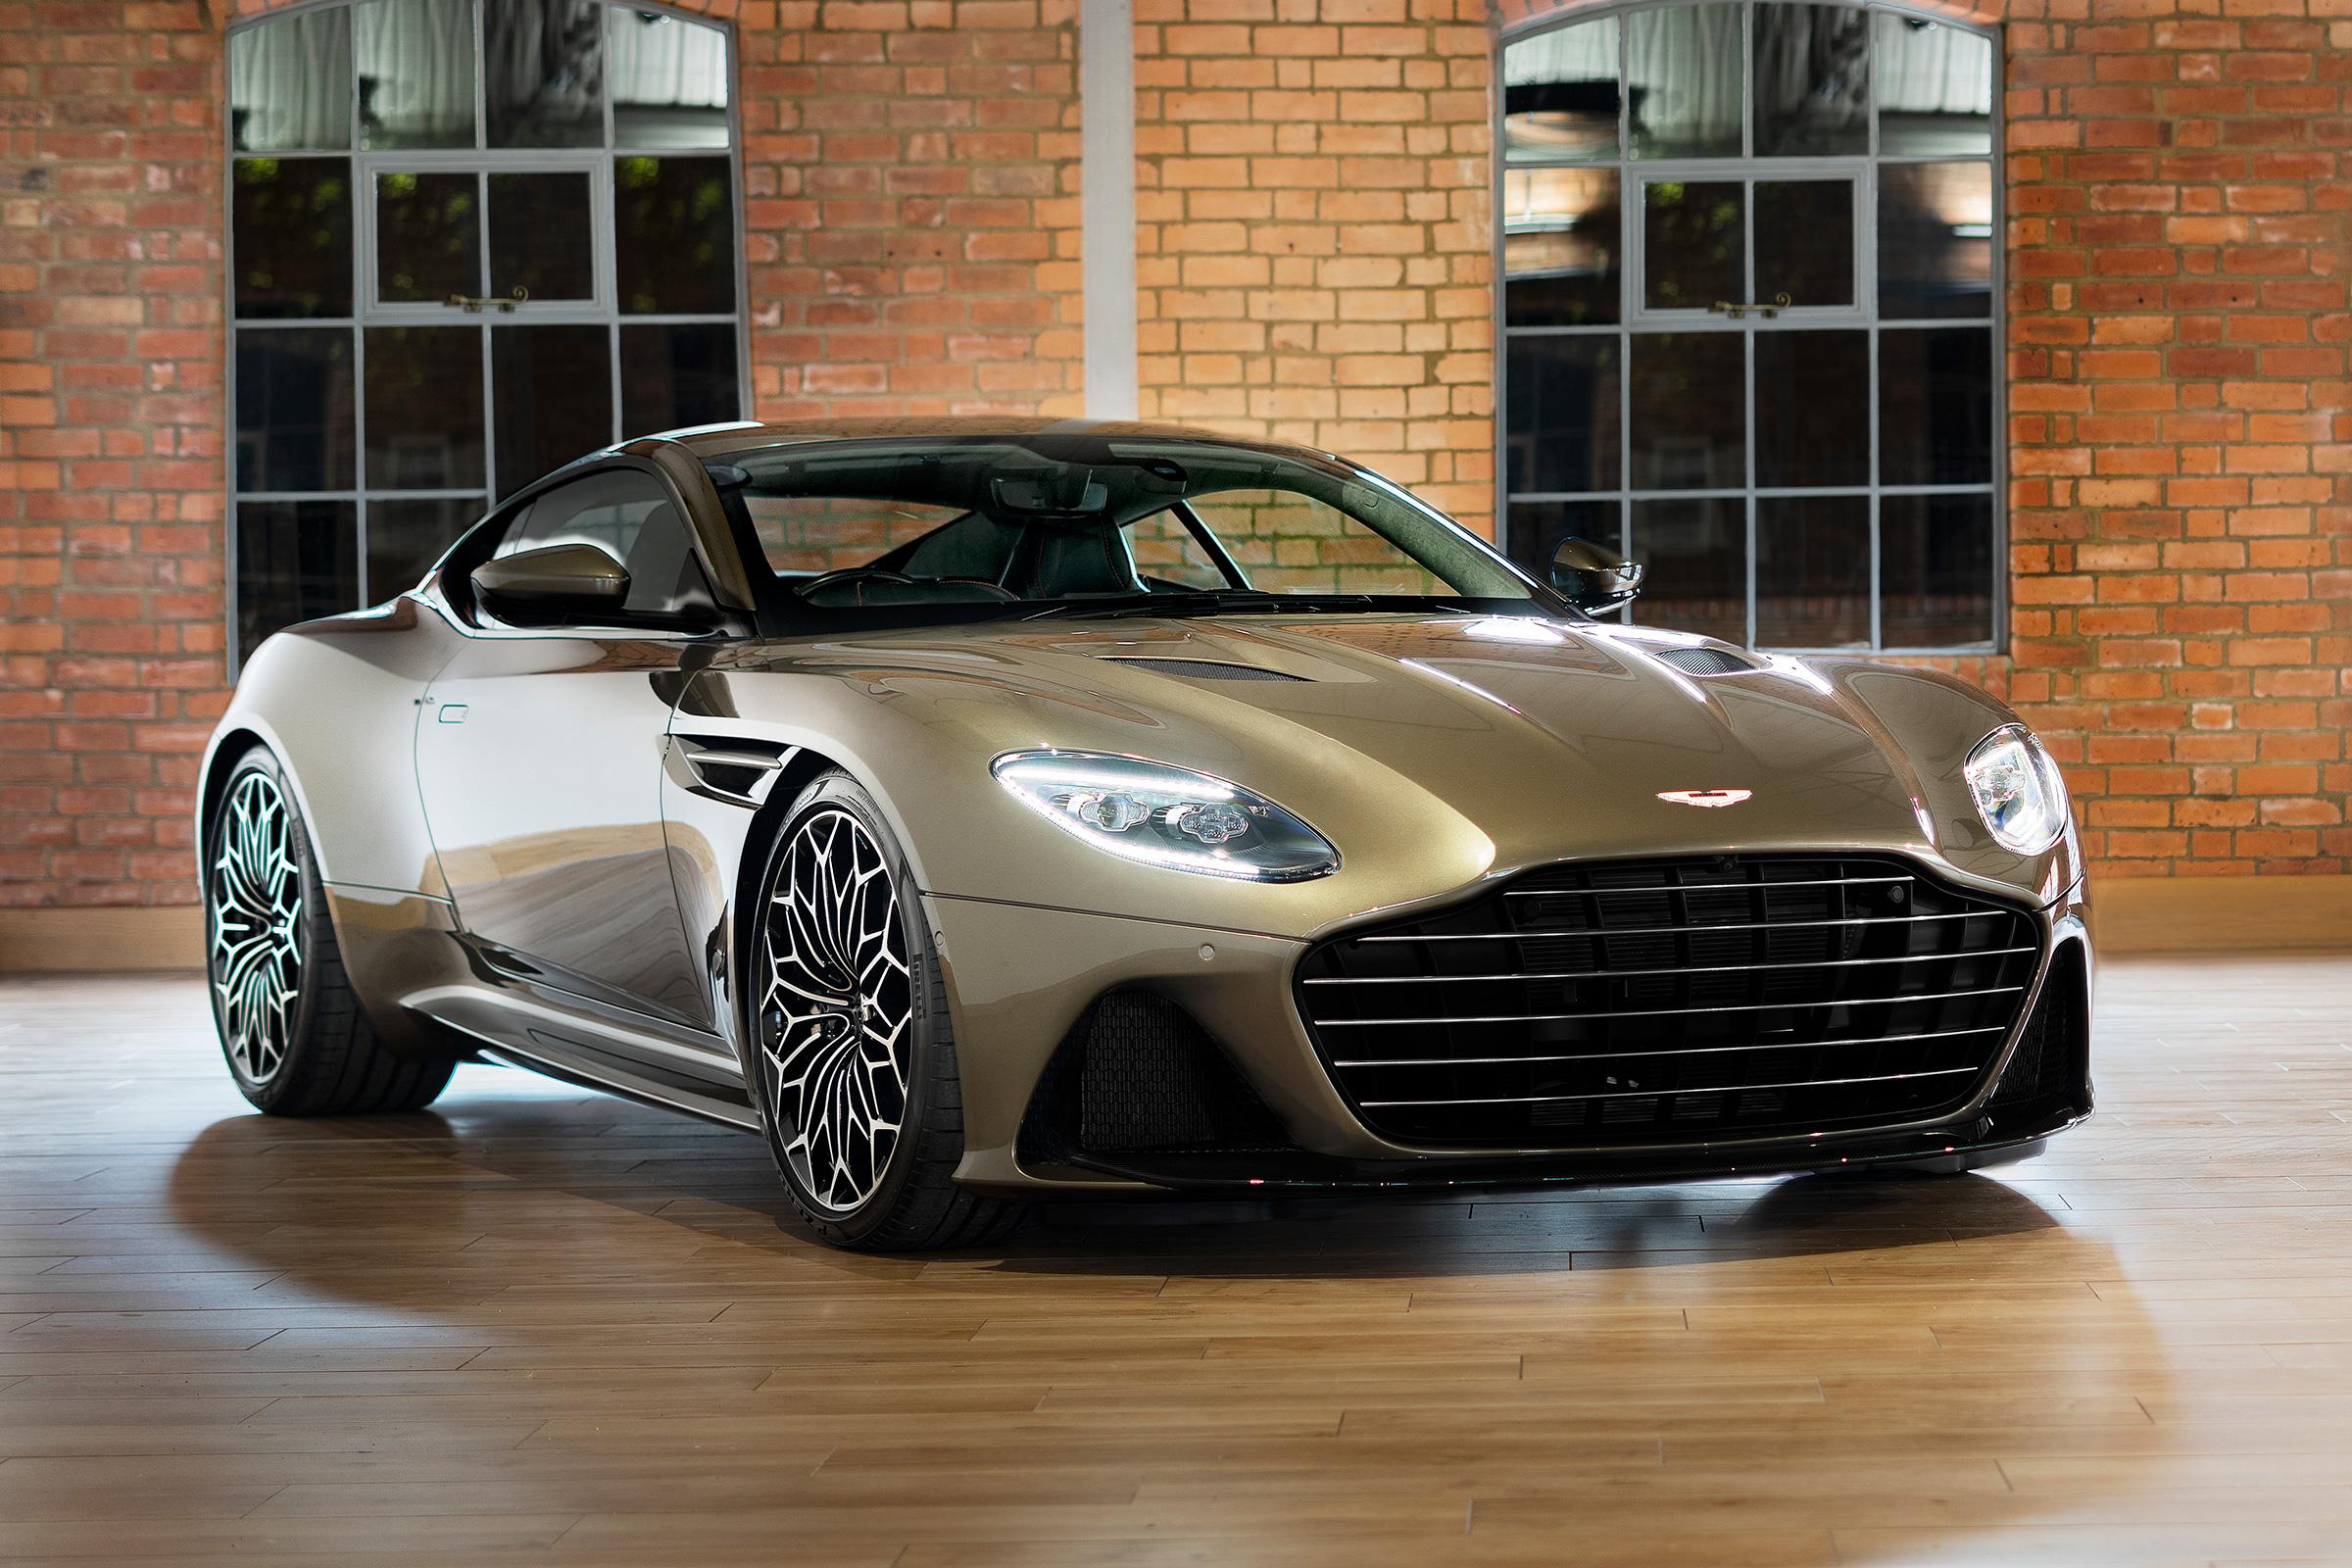 Special Edition 007 Aston Martin Dbs Superleggera Revealed Evo